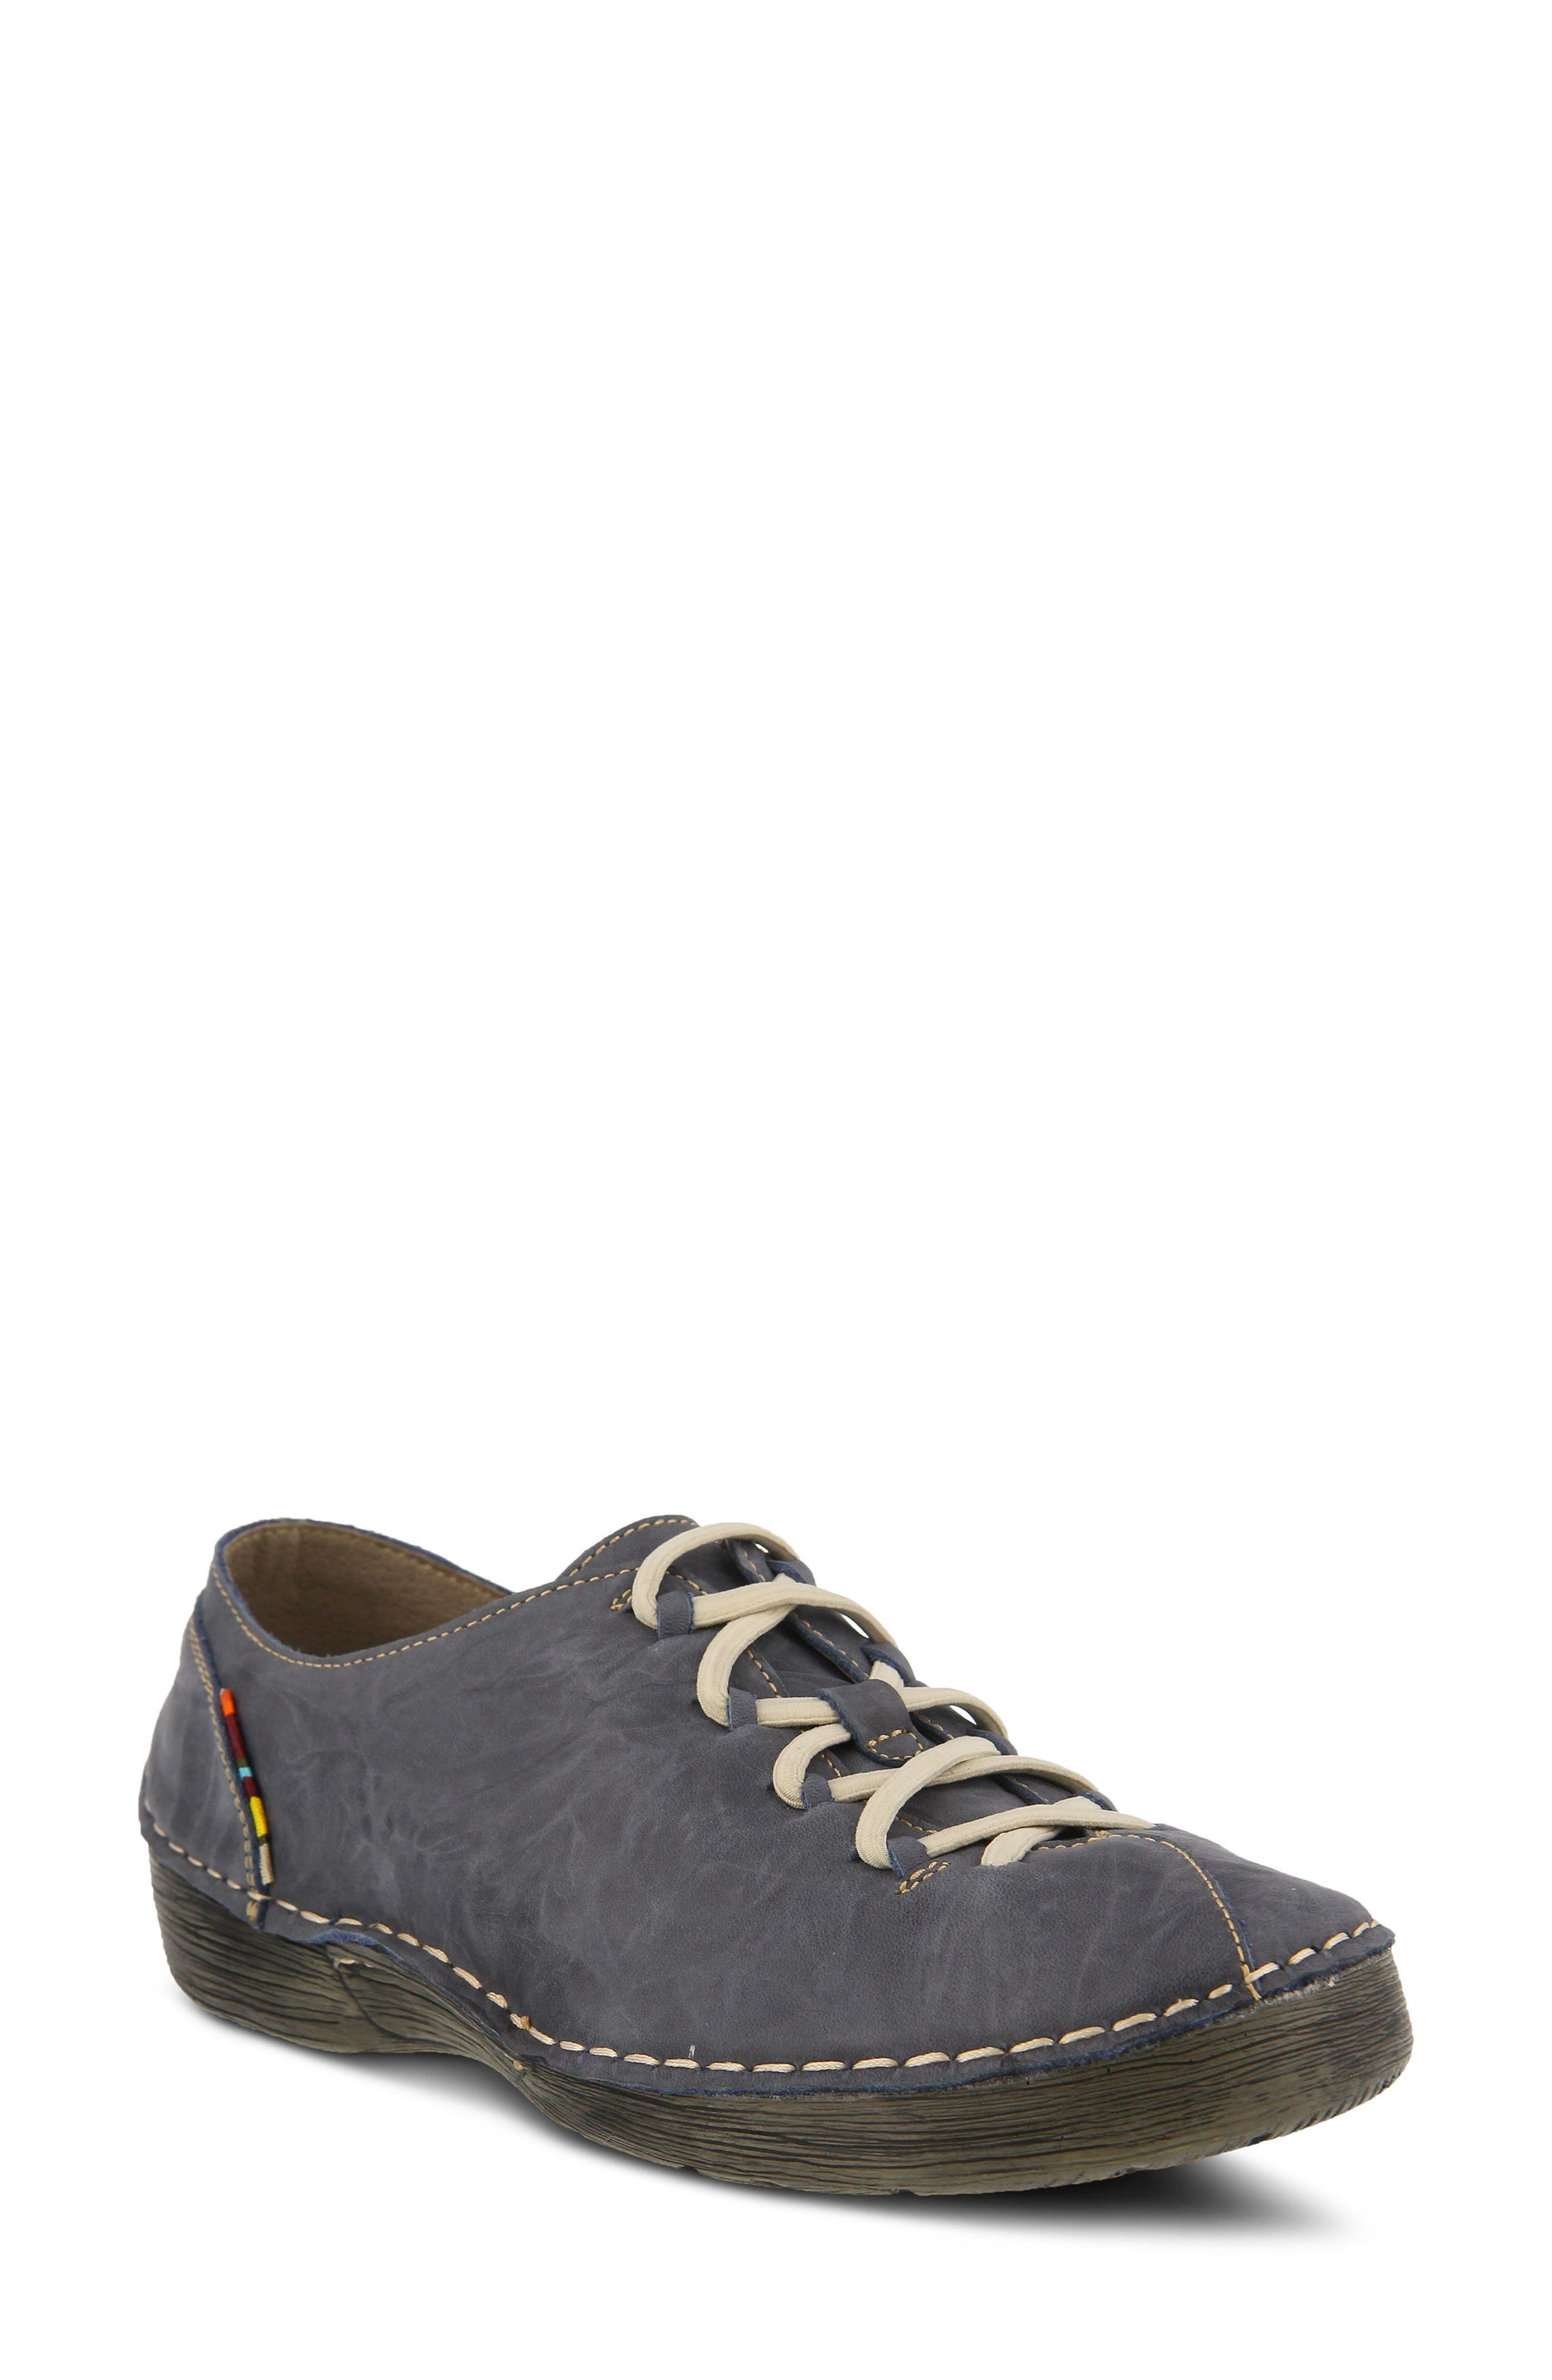 Carhop Sneaker,                         Main,                         color, Blue Leather